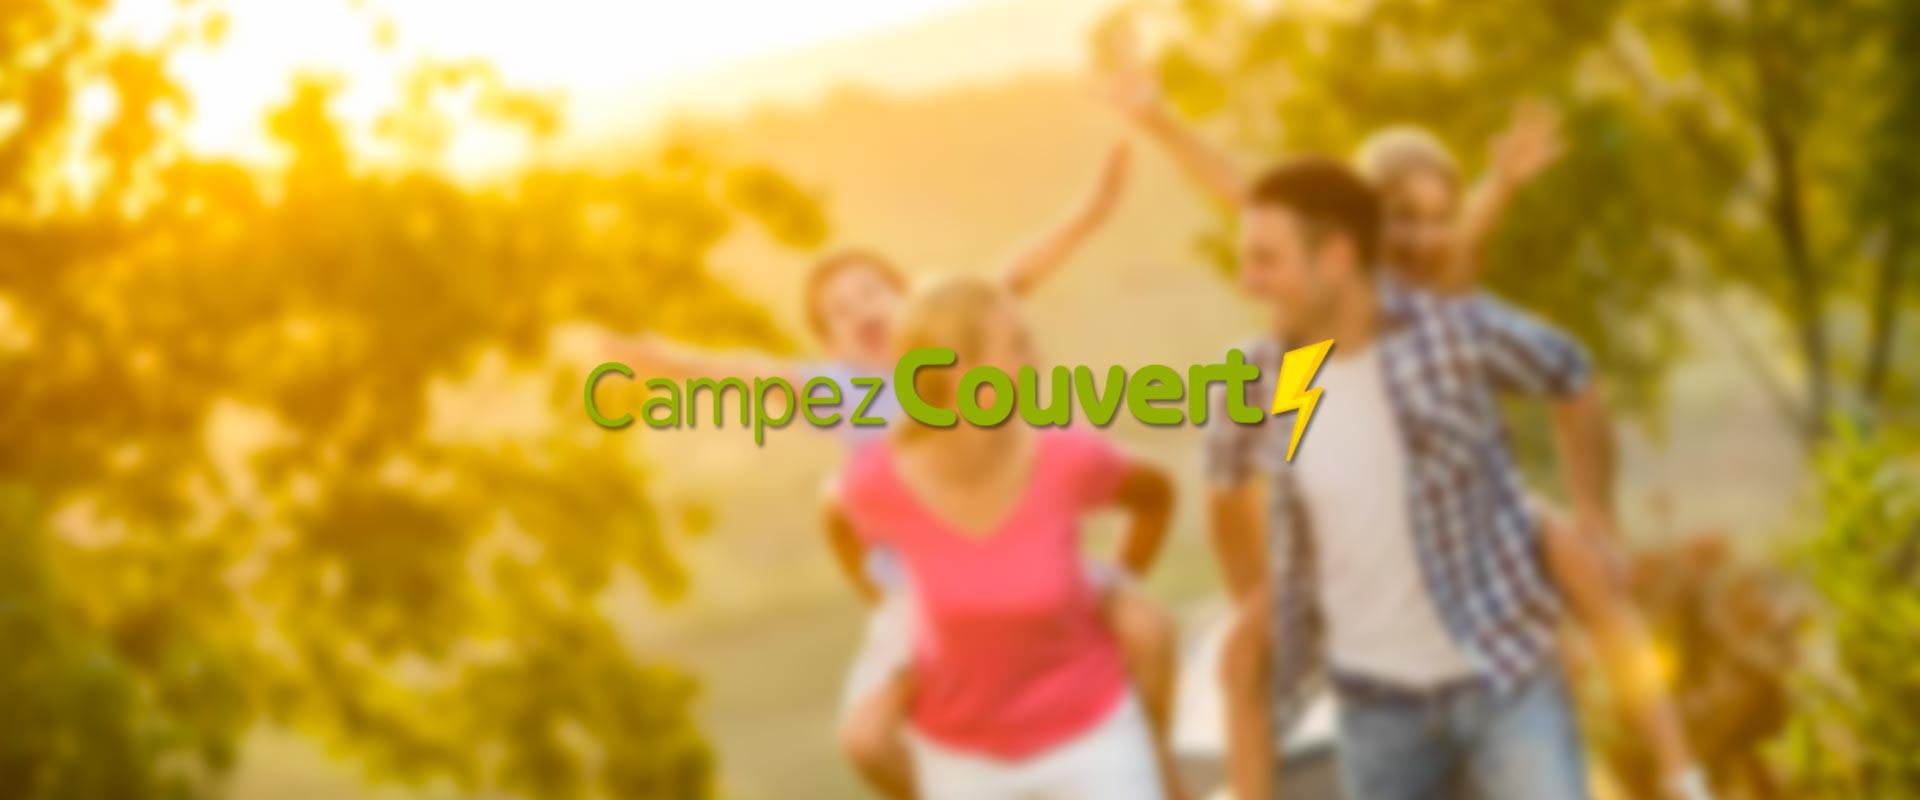 Campez Couvert MAJ COVID-19